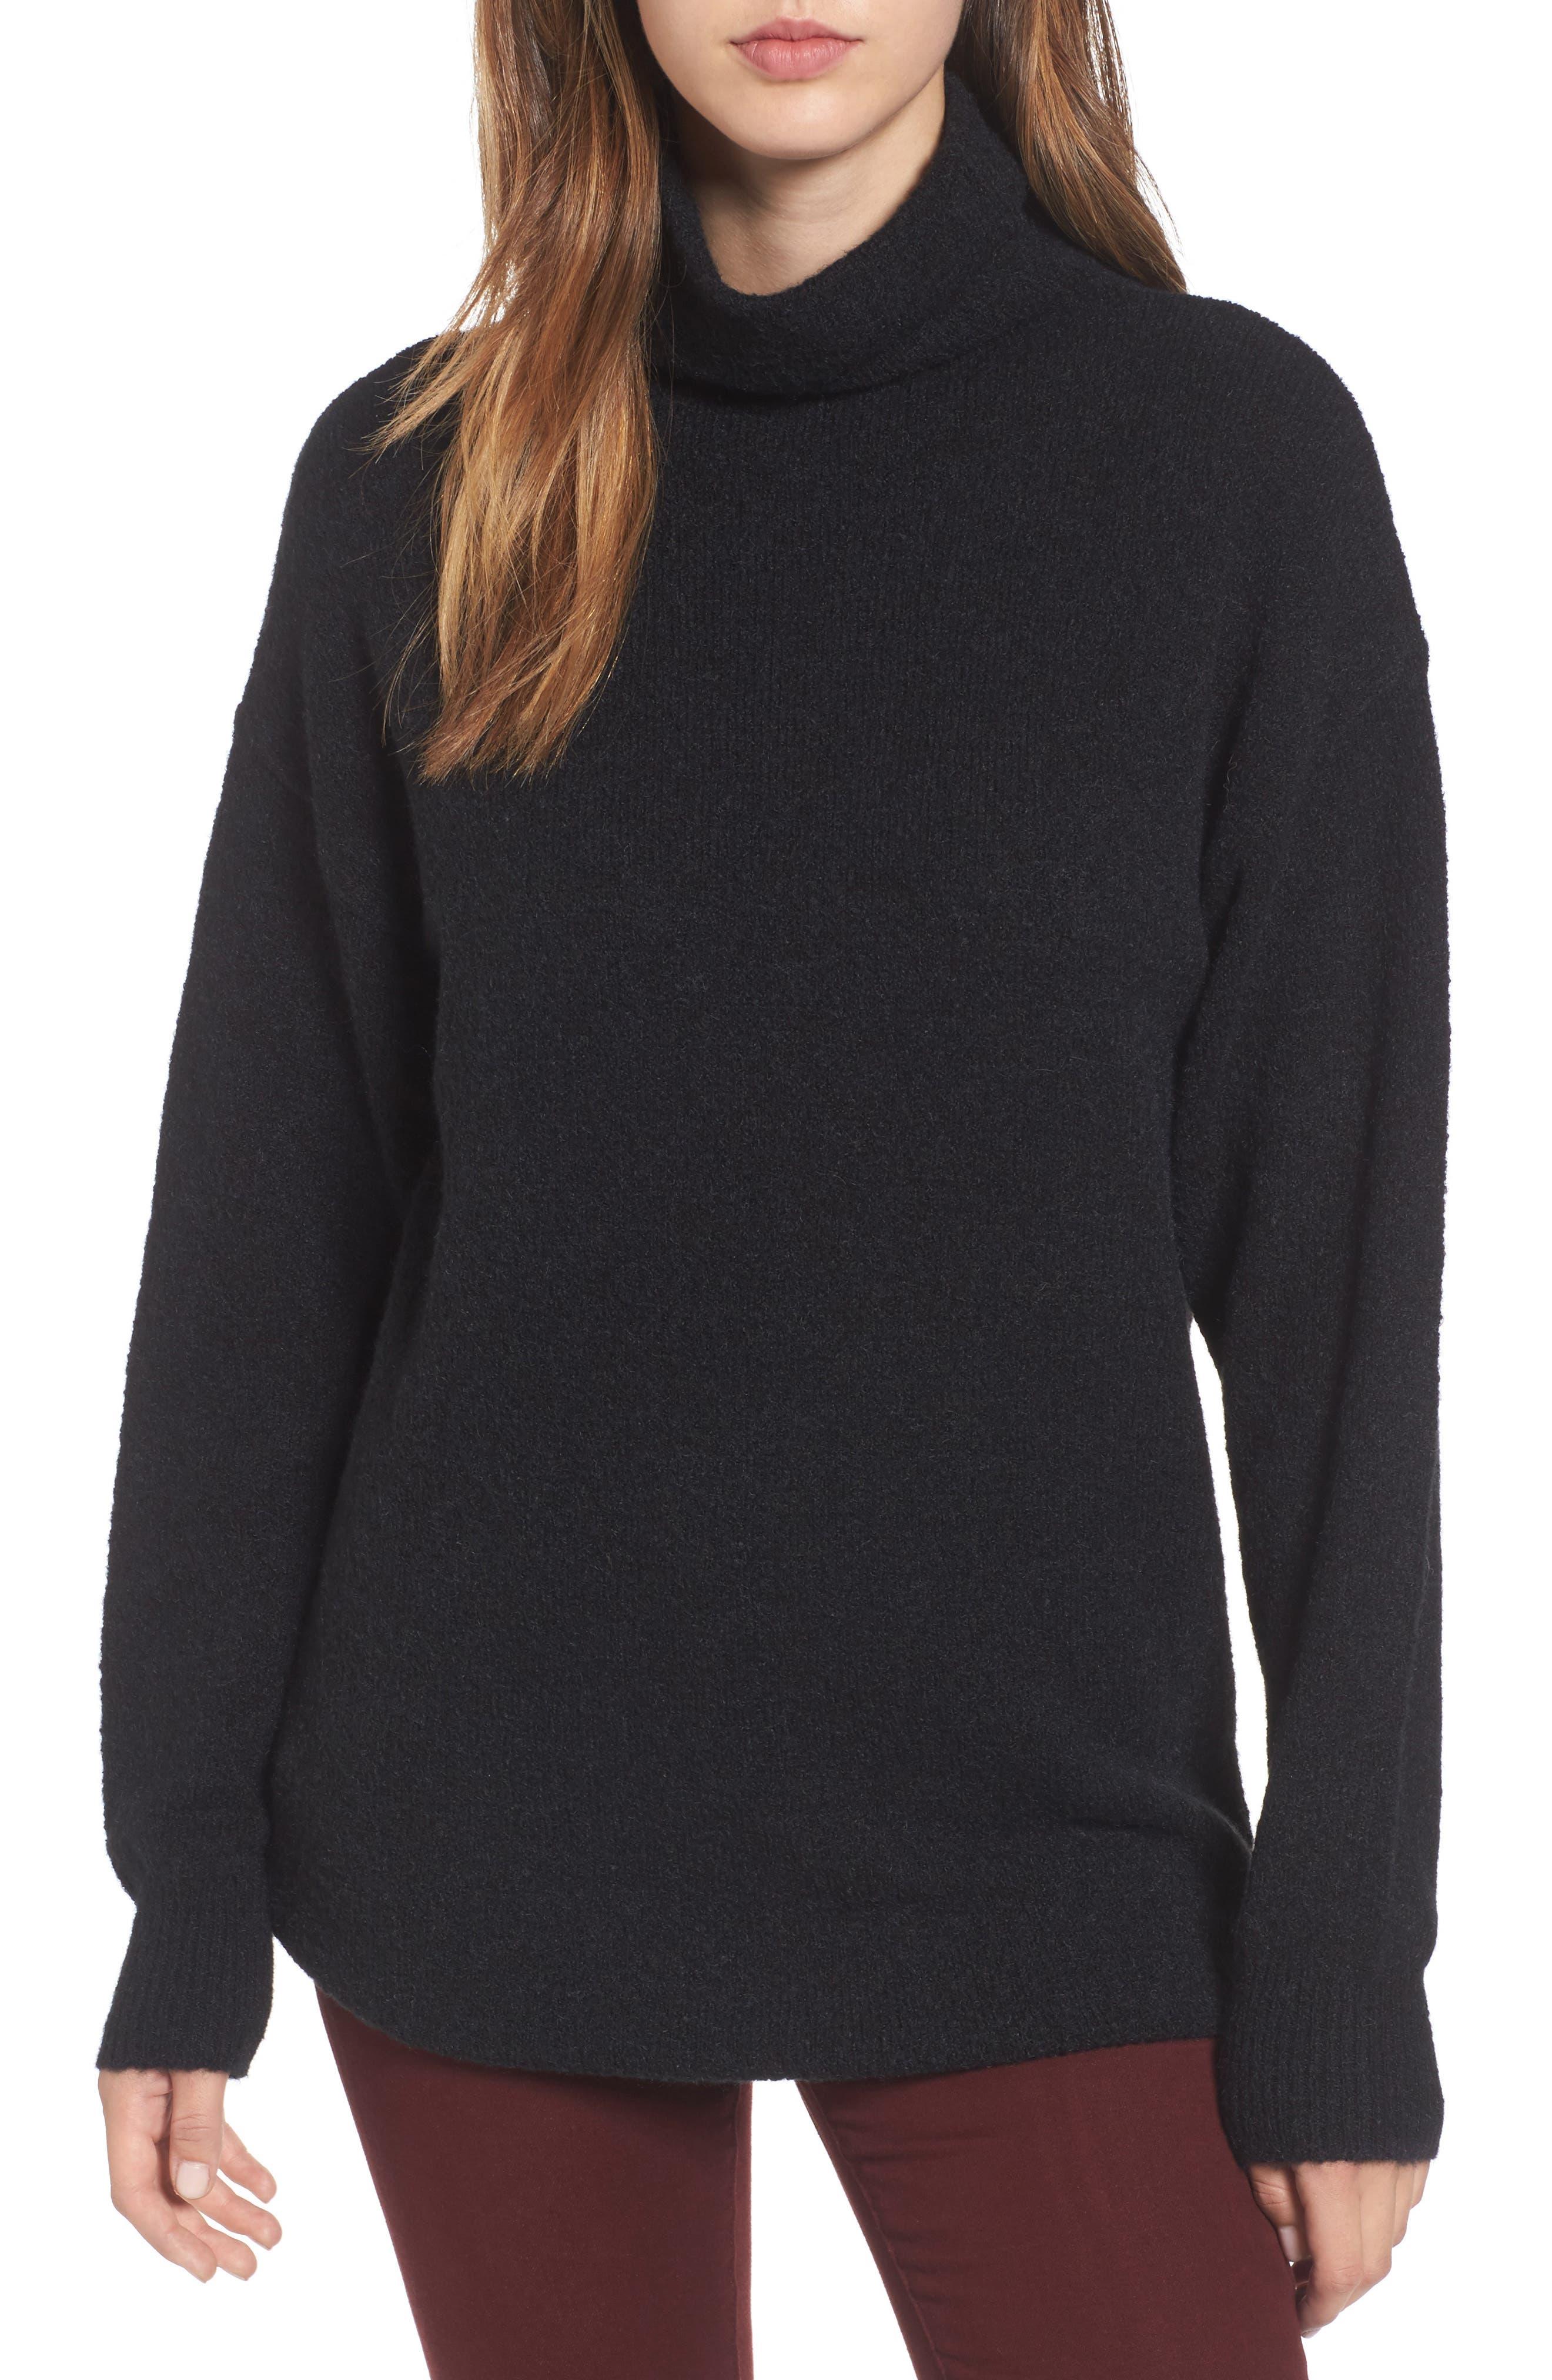 Bouclé Turtleneck Tunic Sweater,                             Main thumbnail 1, color,                             001